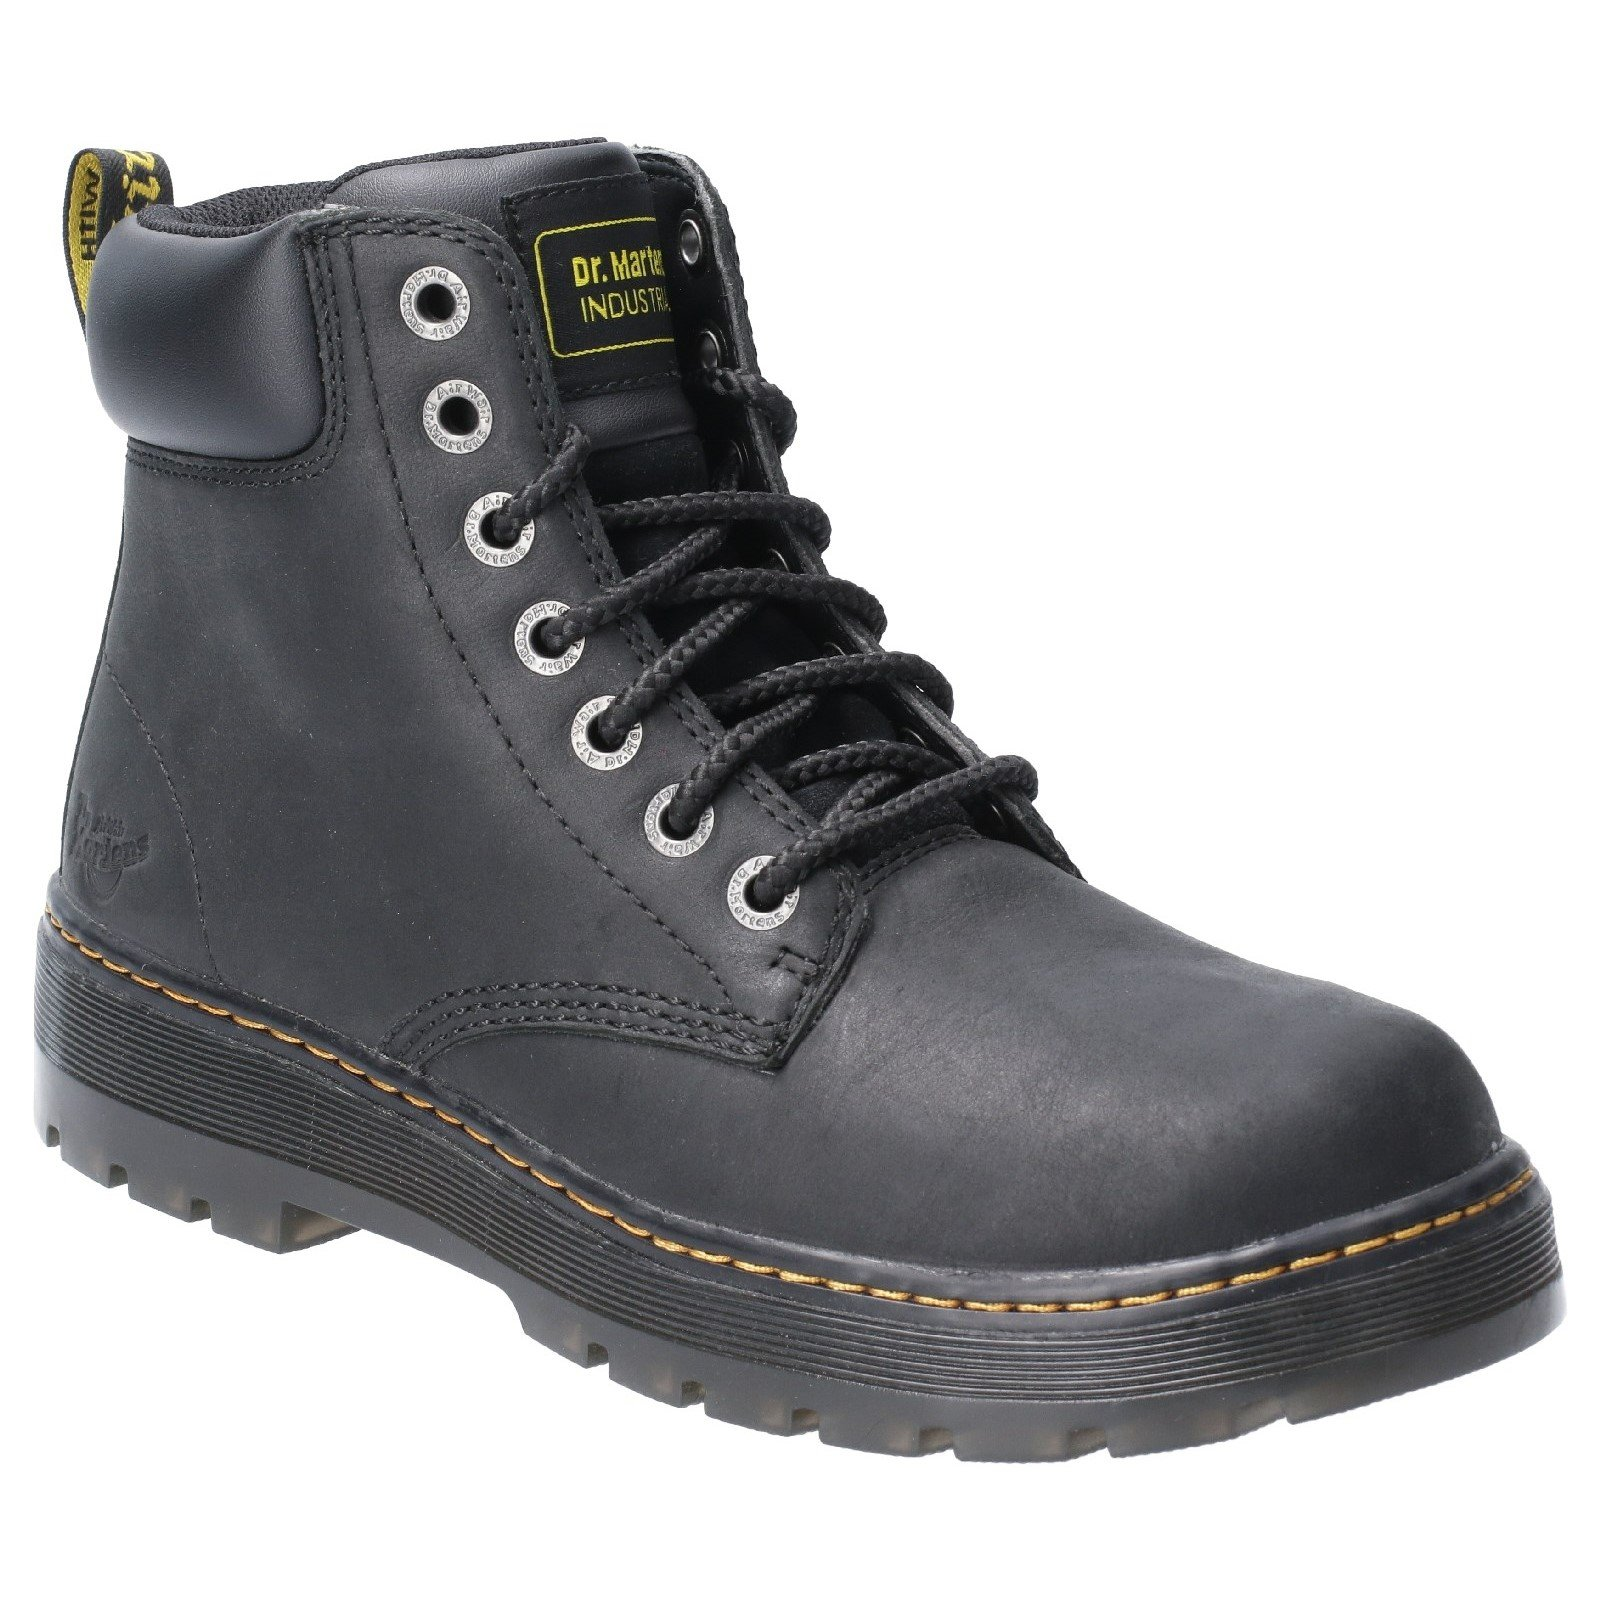 Dr Martens Men's Winch Non-Safety Work Boot Black 29821 - Black 11